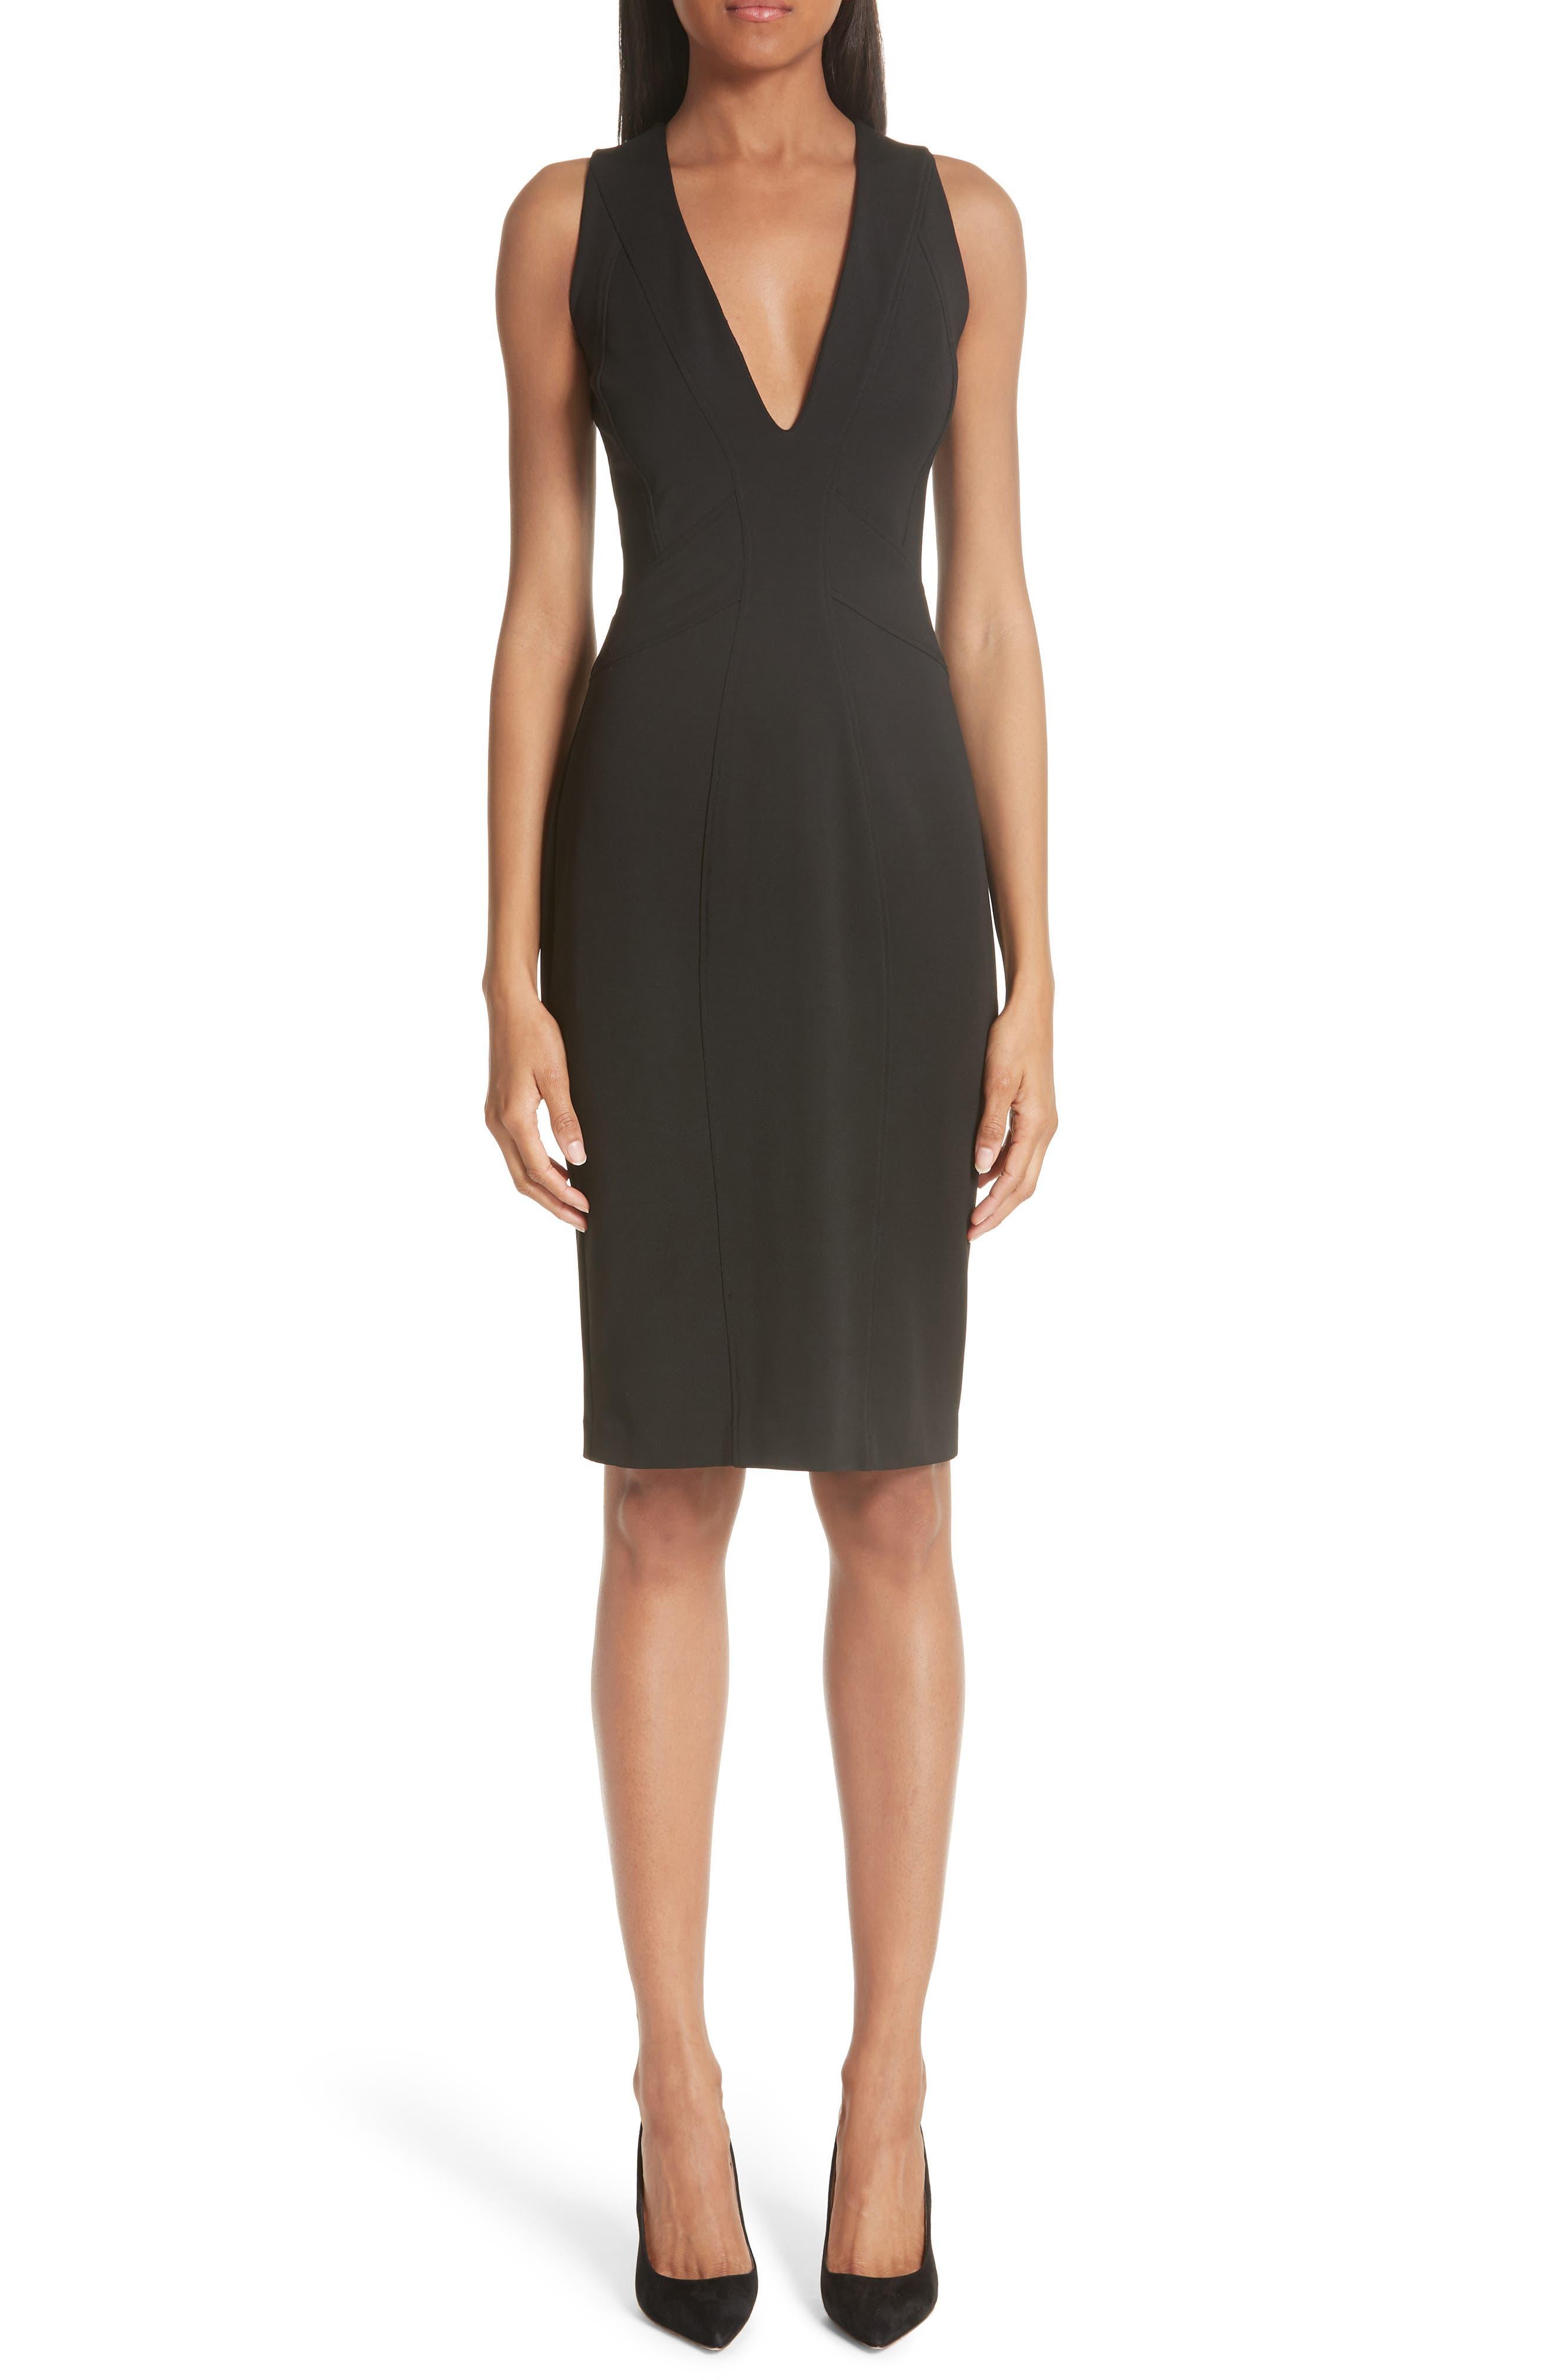 ZAC ZAC POSEN Sirena Body-Con Dress, Main, color, BLACK